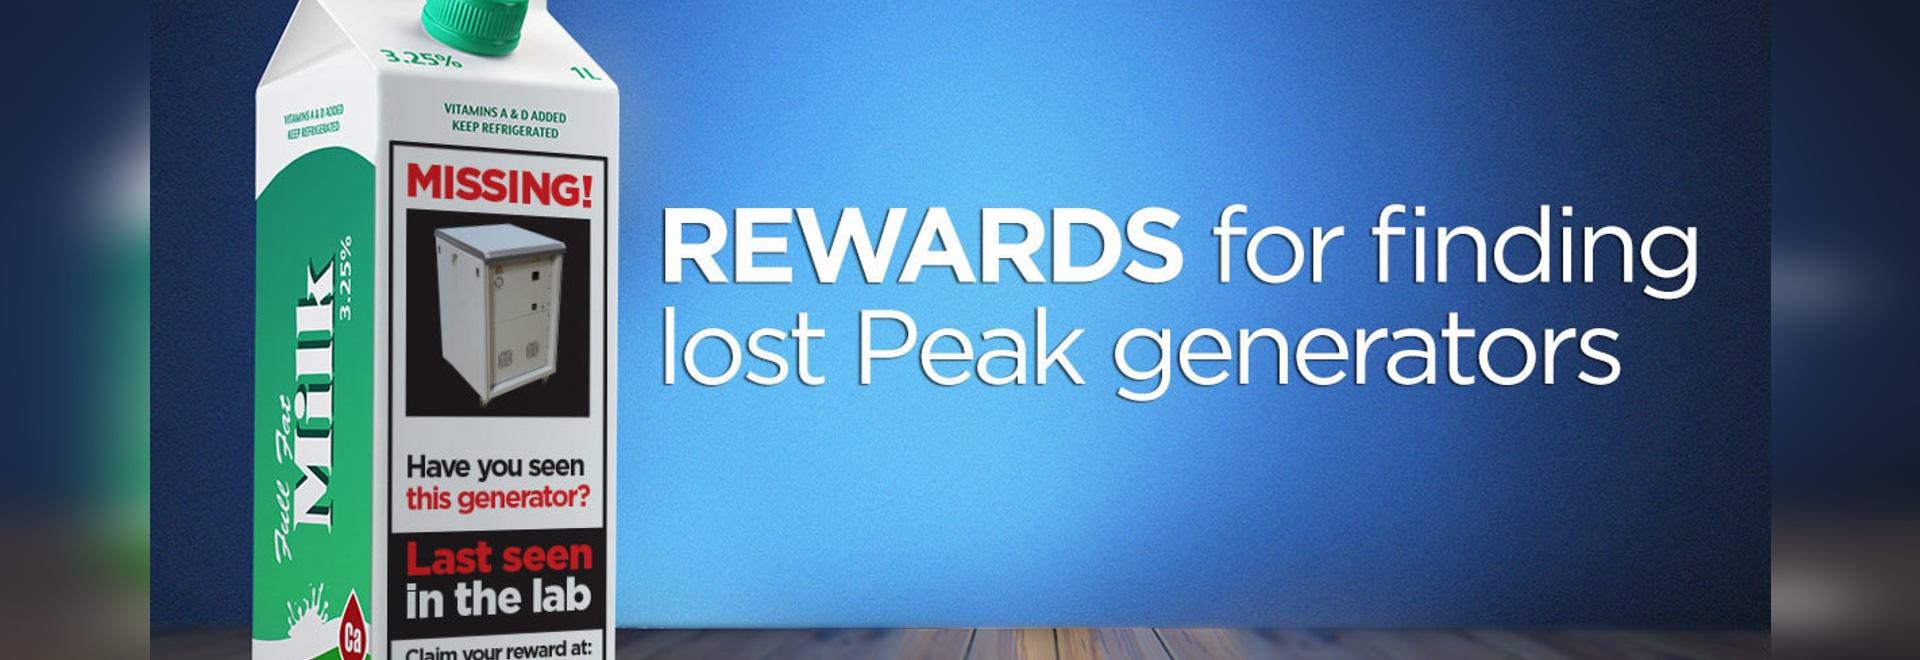 Rewards for finding lost Peak generators